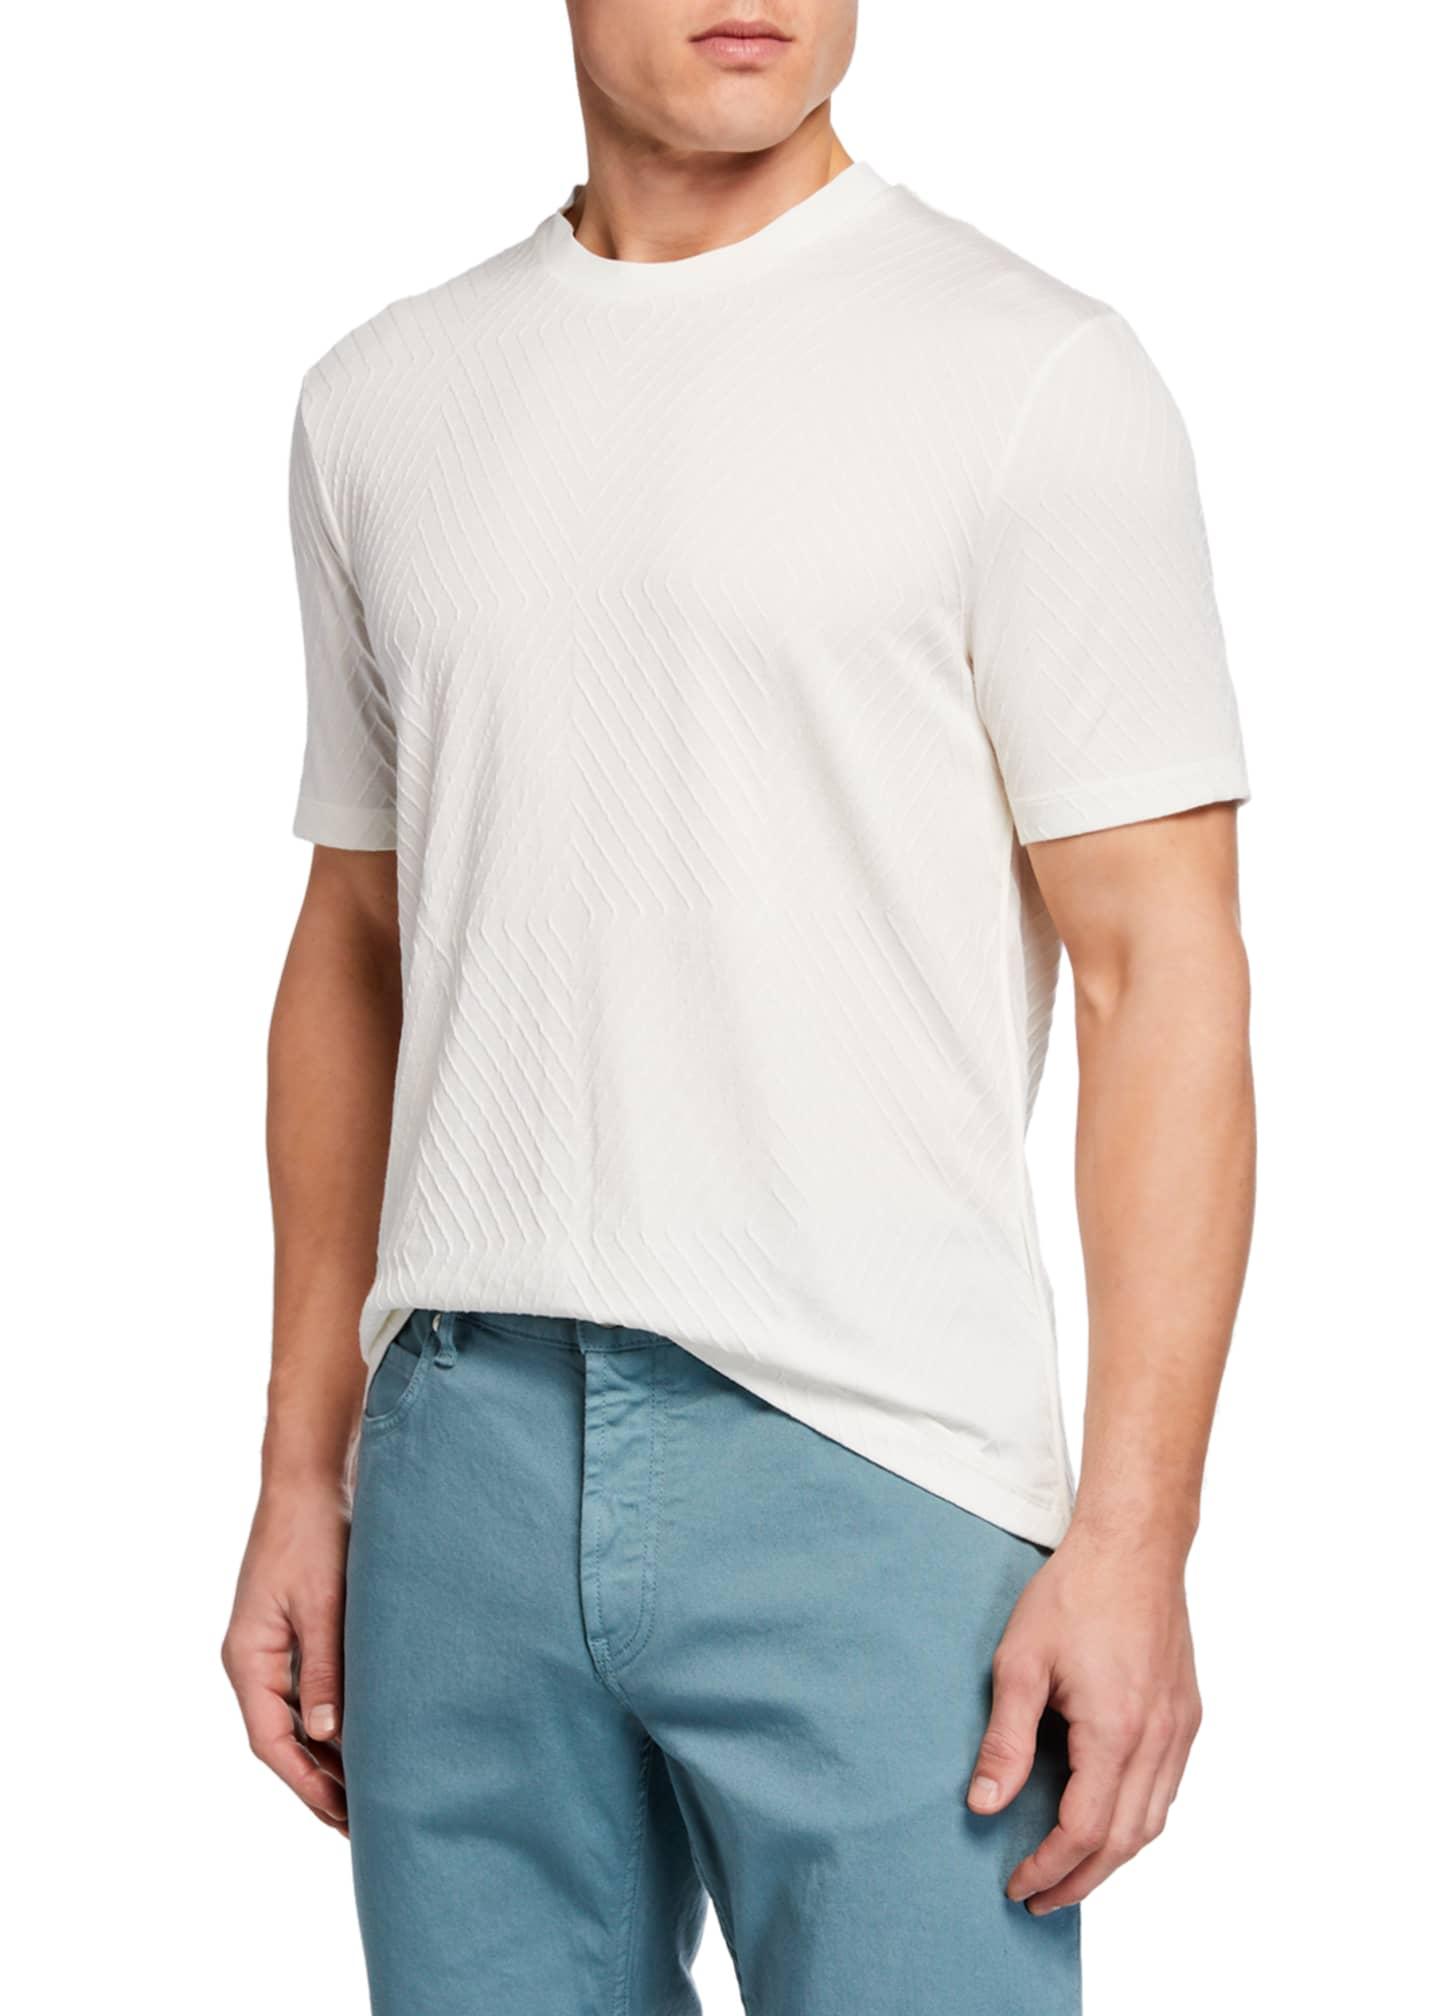 Giorgio Armani Men's Crewneck Jacquard T-Shirt